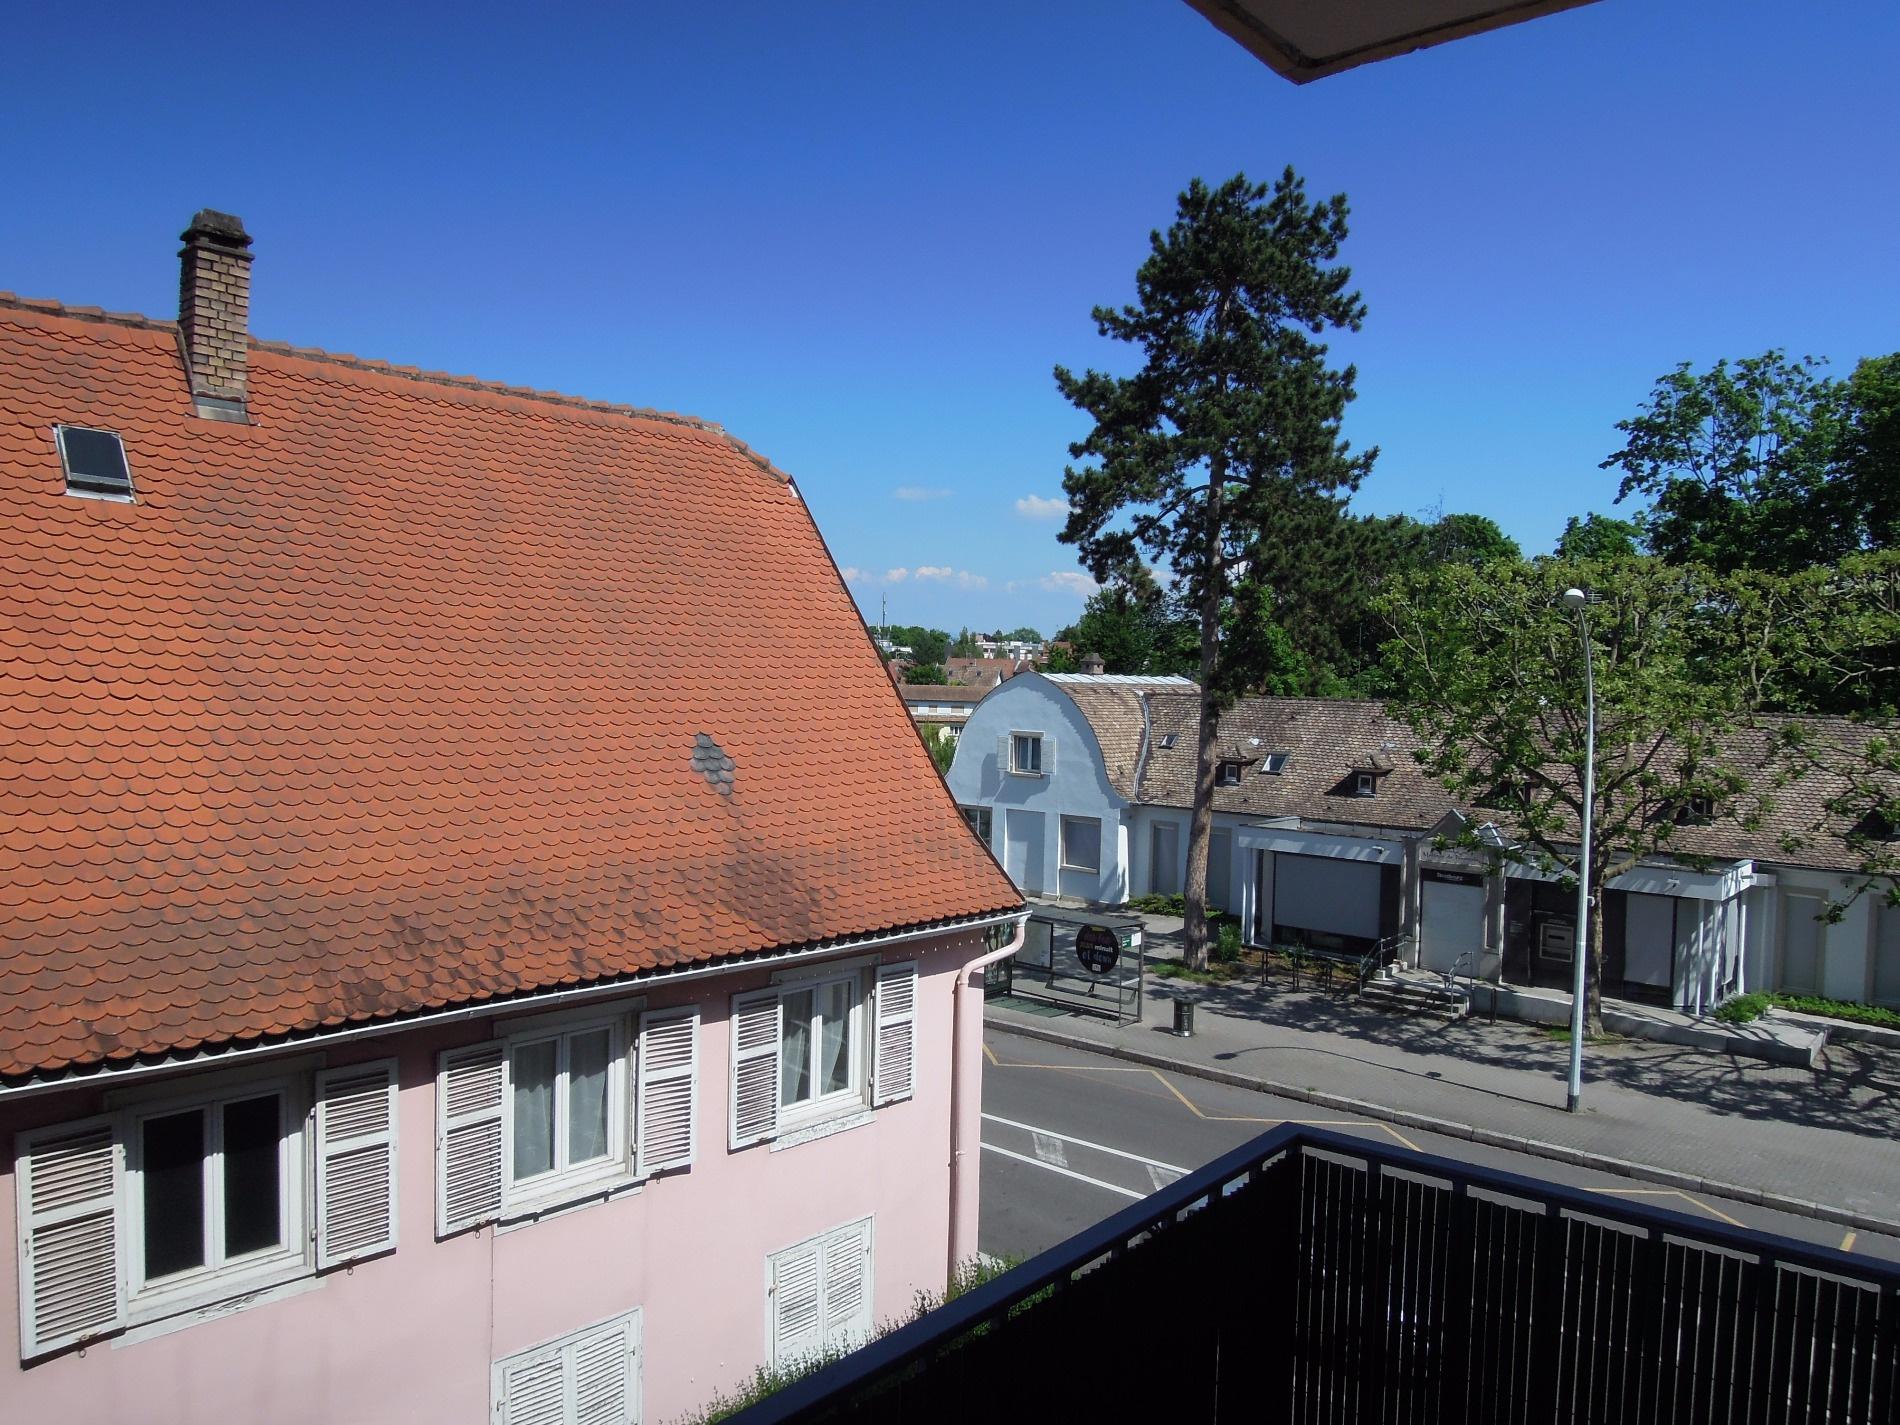 Vente Strasbourg Robertsau Investissement Locatif Appartement F5 De 90m